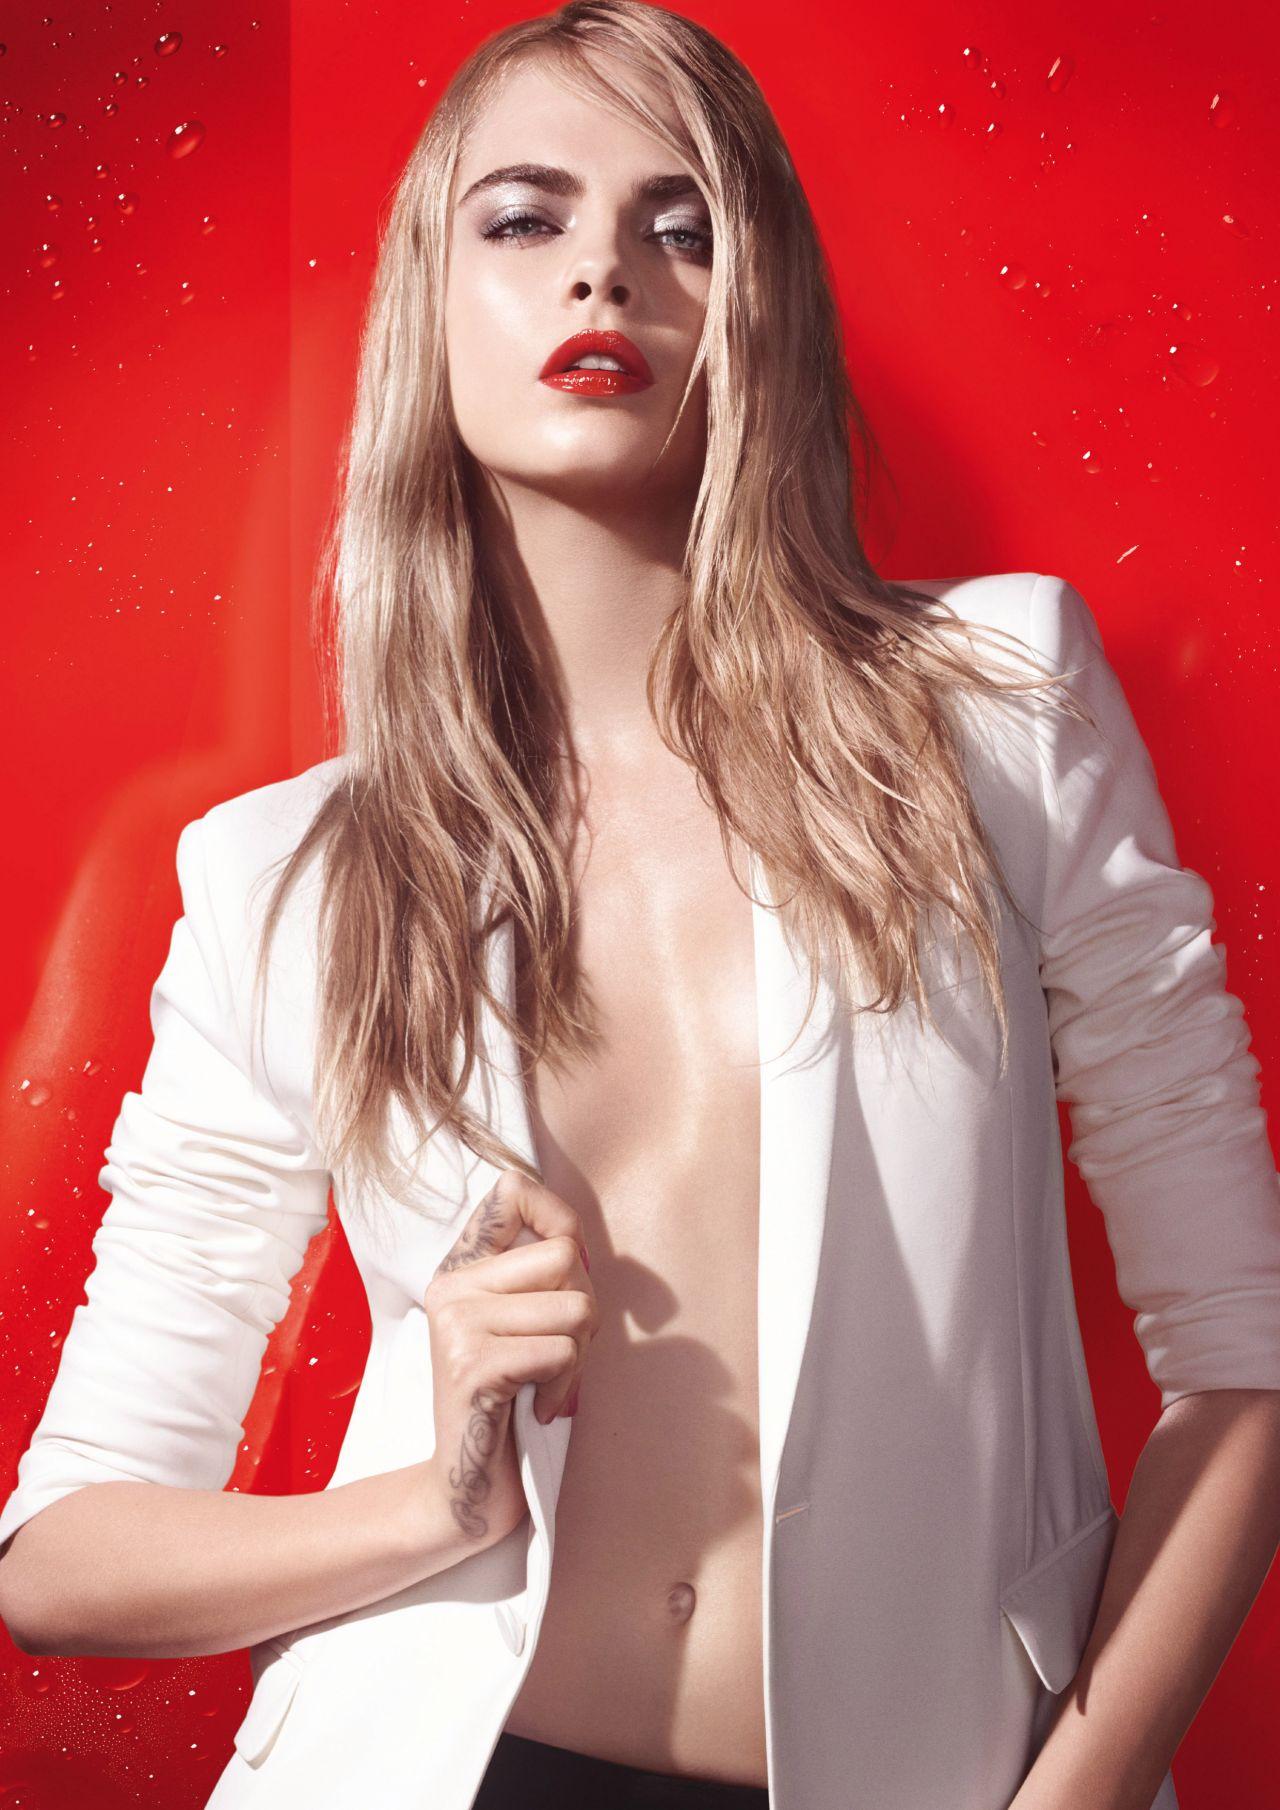 Cara Delevingne Ysl Beaute Summer Splash Campaign